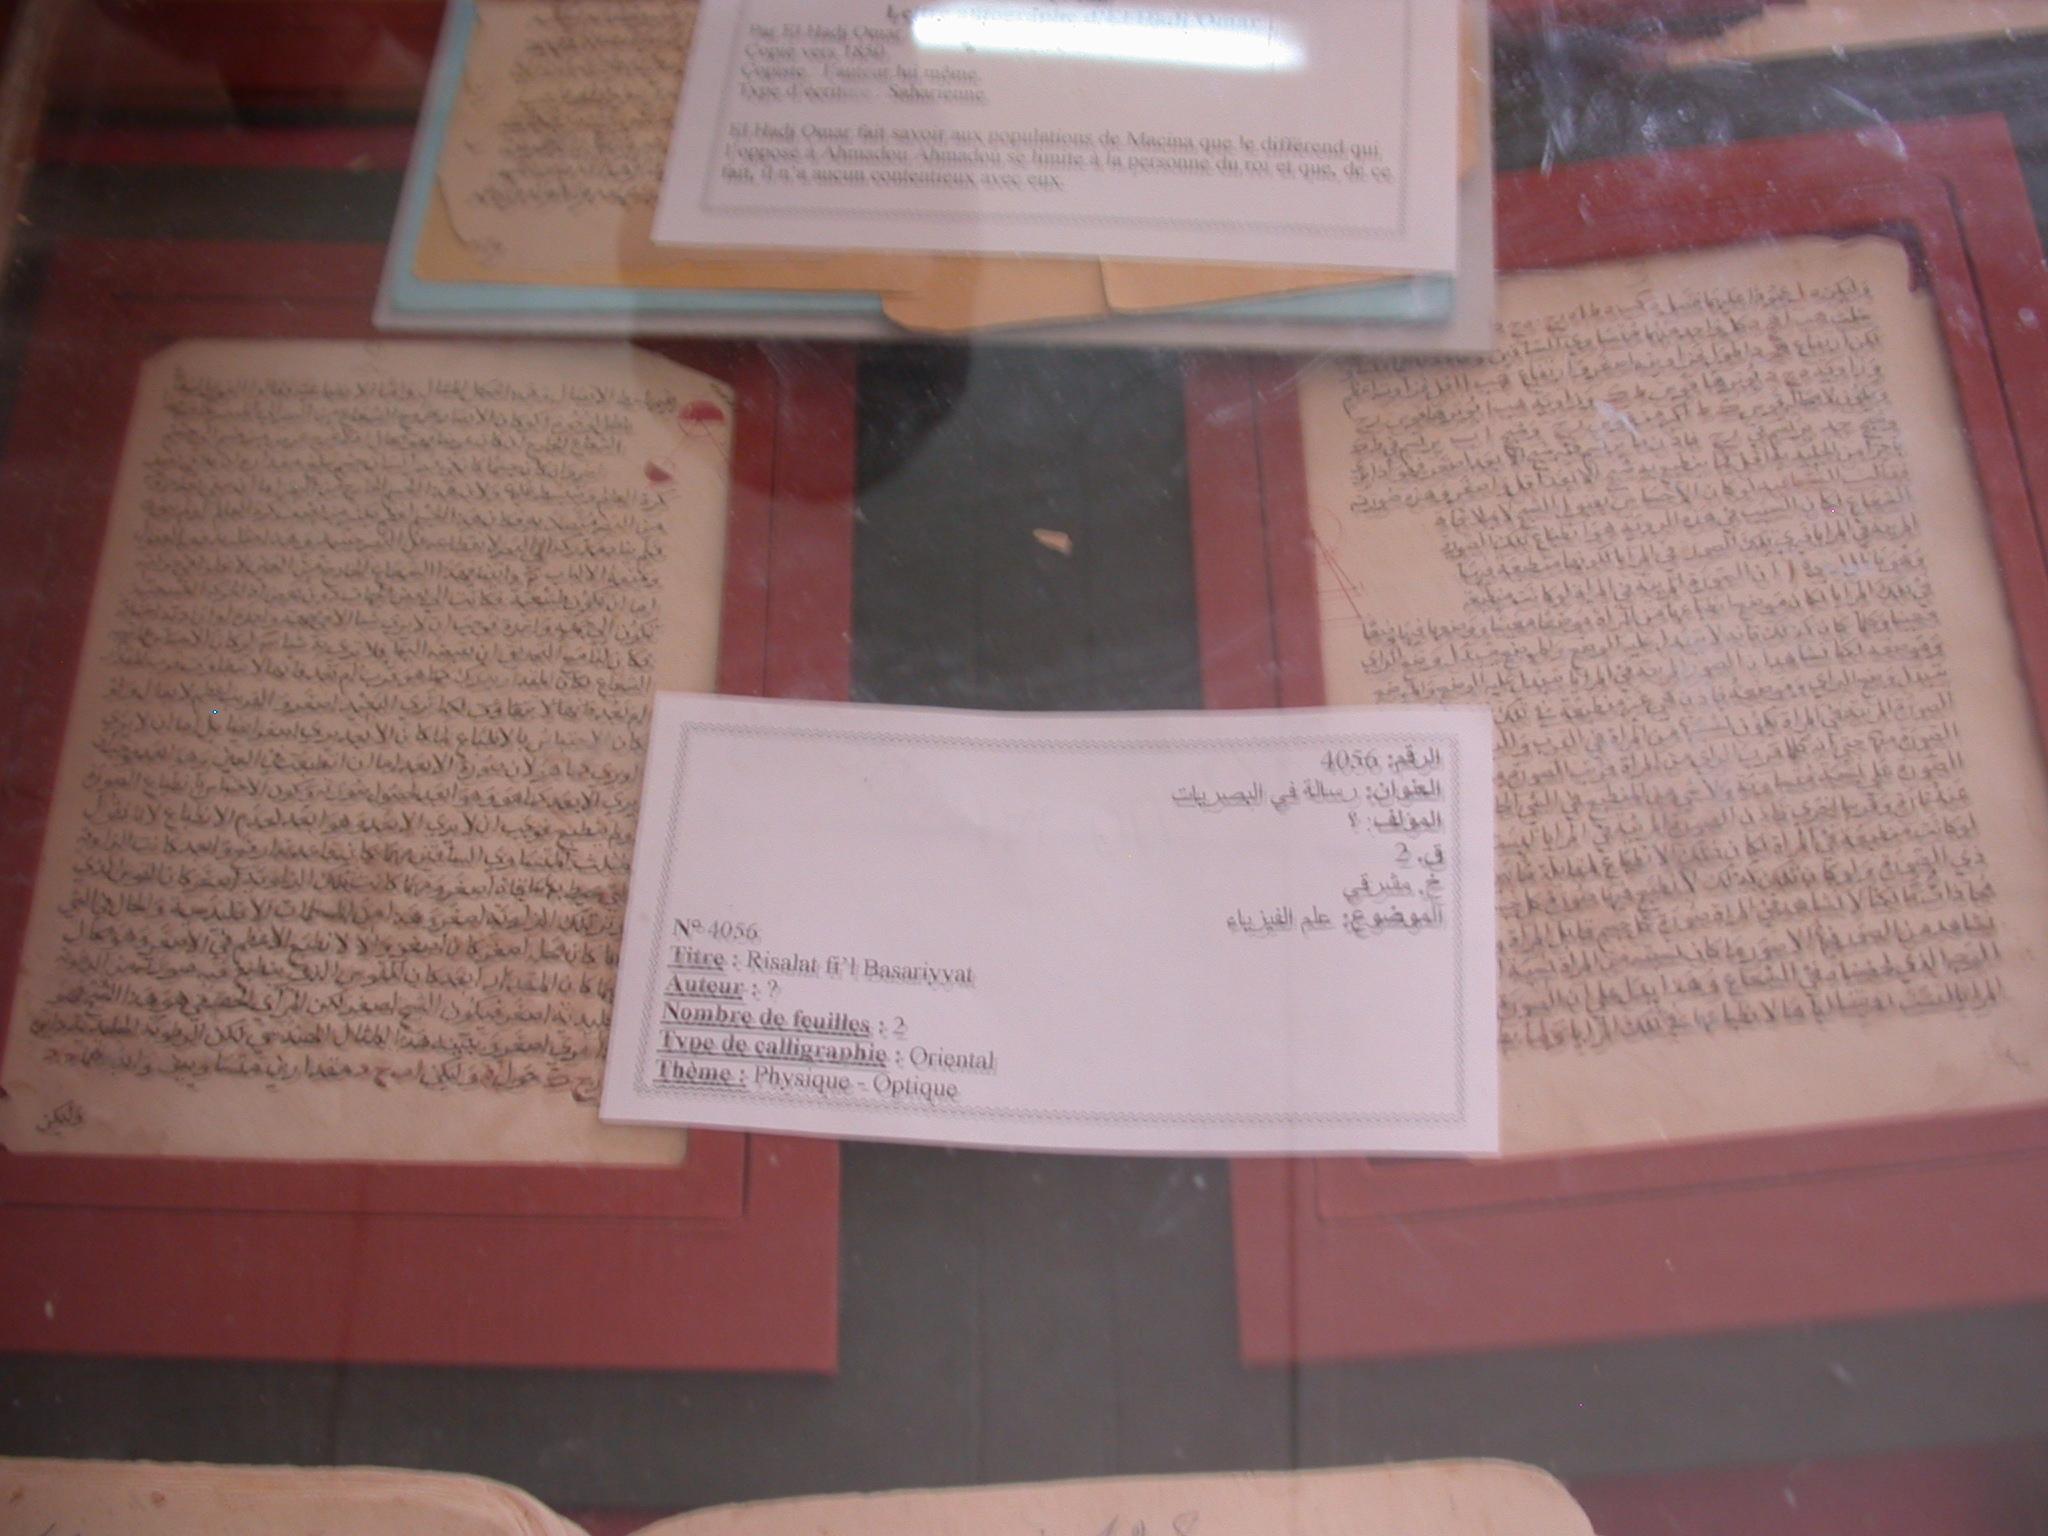 Manuscript, Risalat fil Basariyyat, Ahmed Baba Institute, Institut des Hautes Etudes et de Recherches Islamiques, Timbuktu, Mali